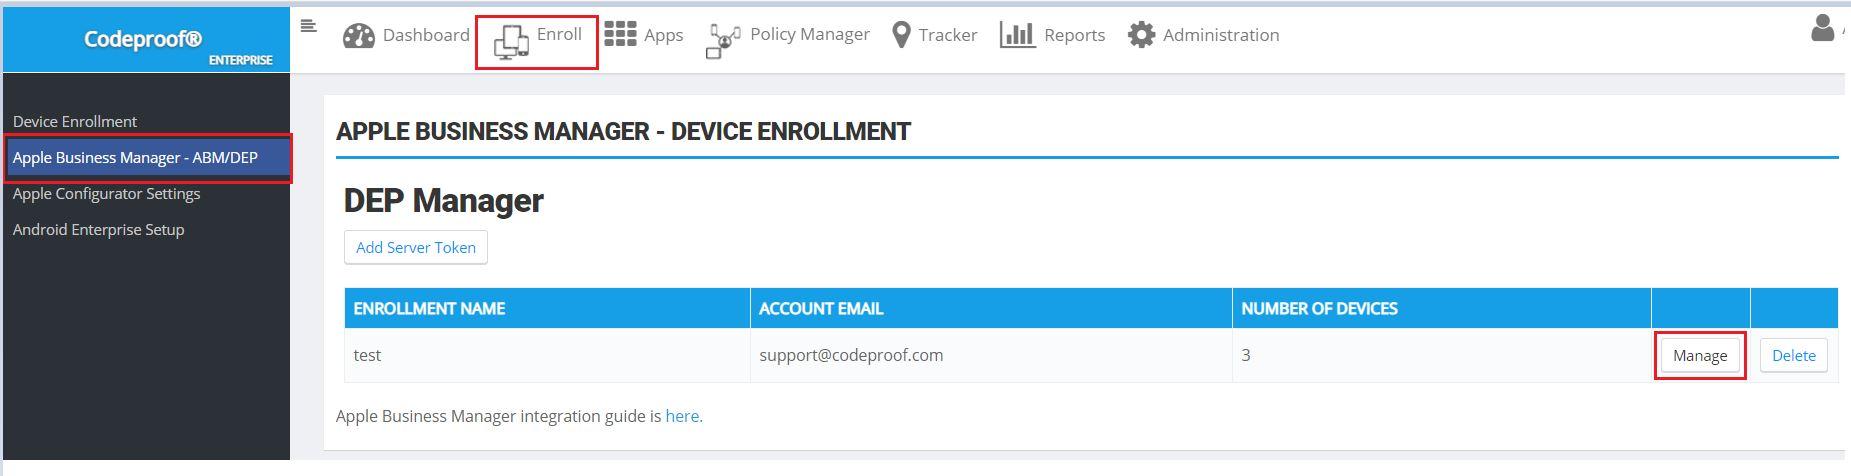 Managing DEP enrolled devices